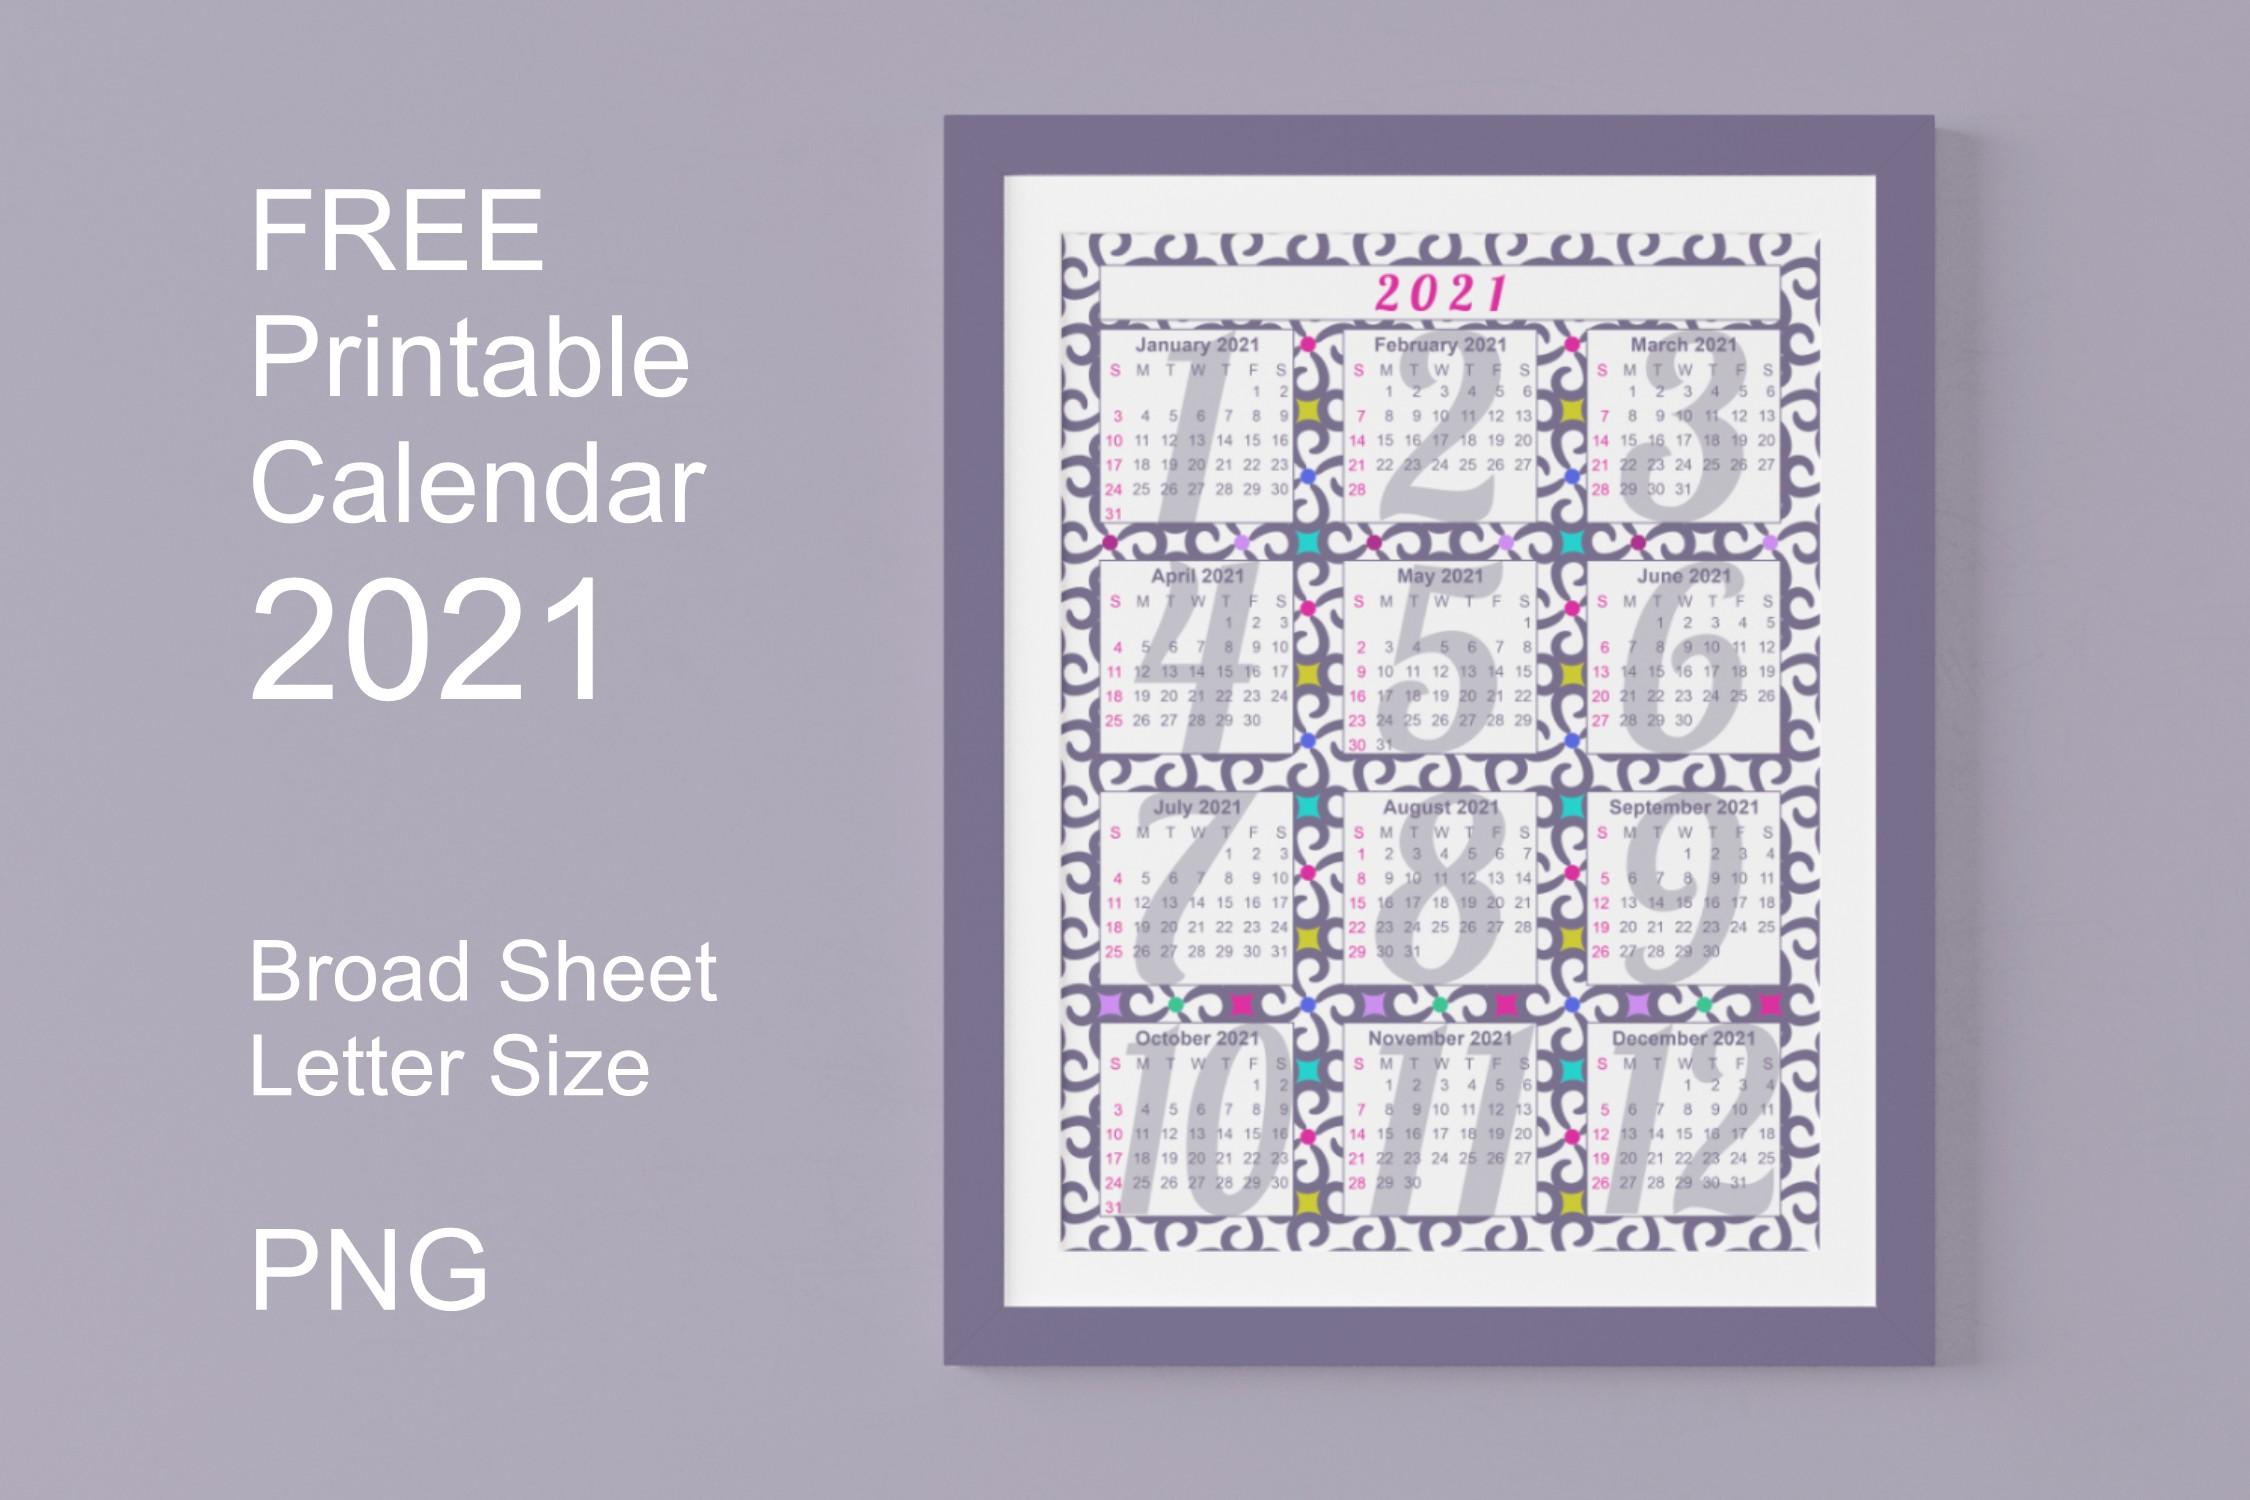 Calendar 2021 Printables Graphic by printt hang